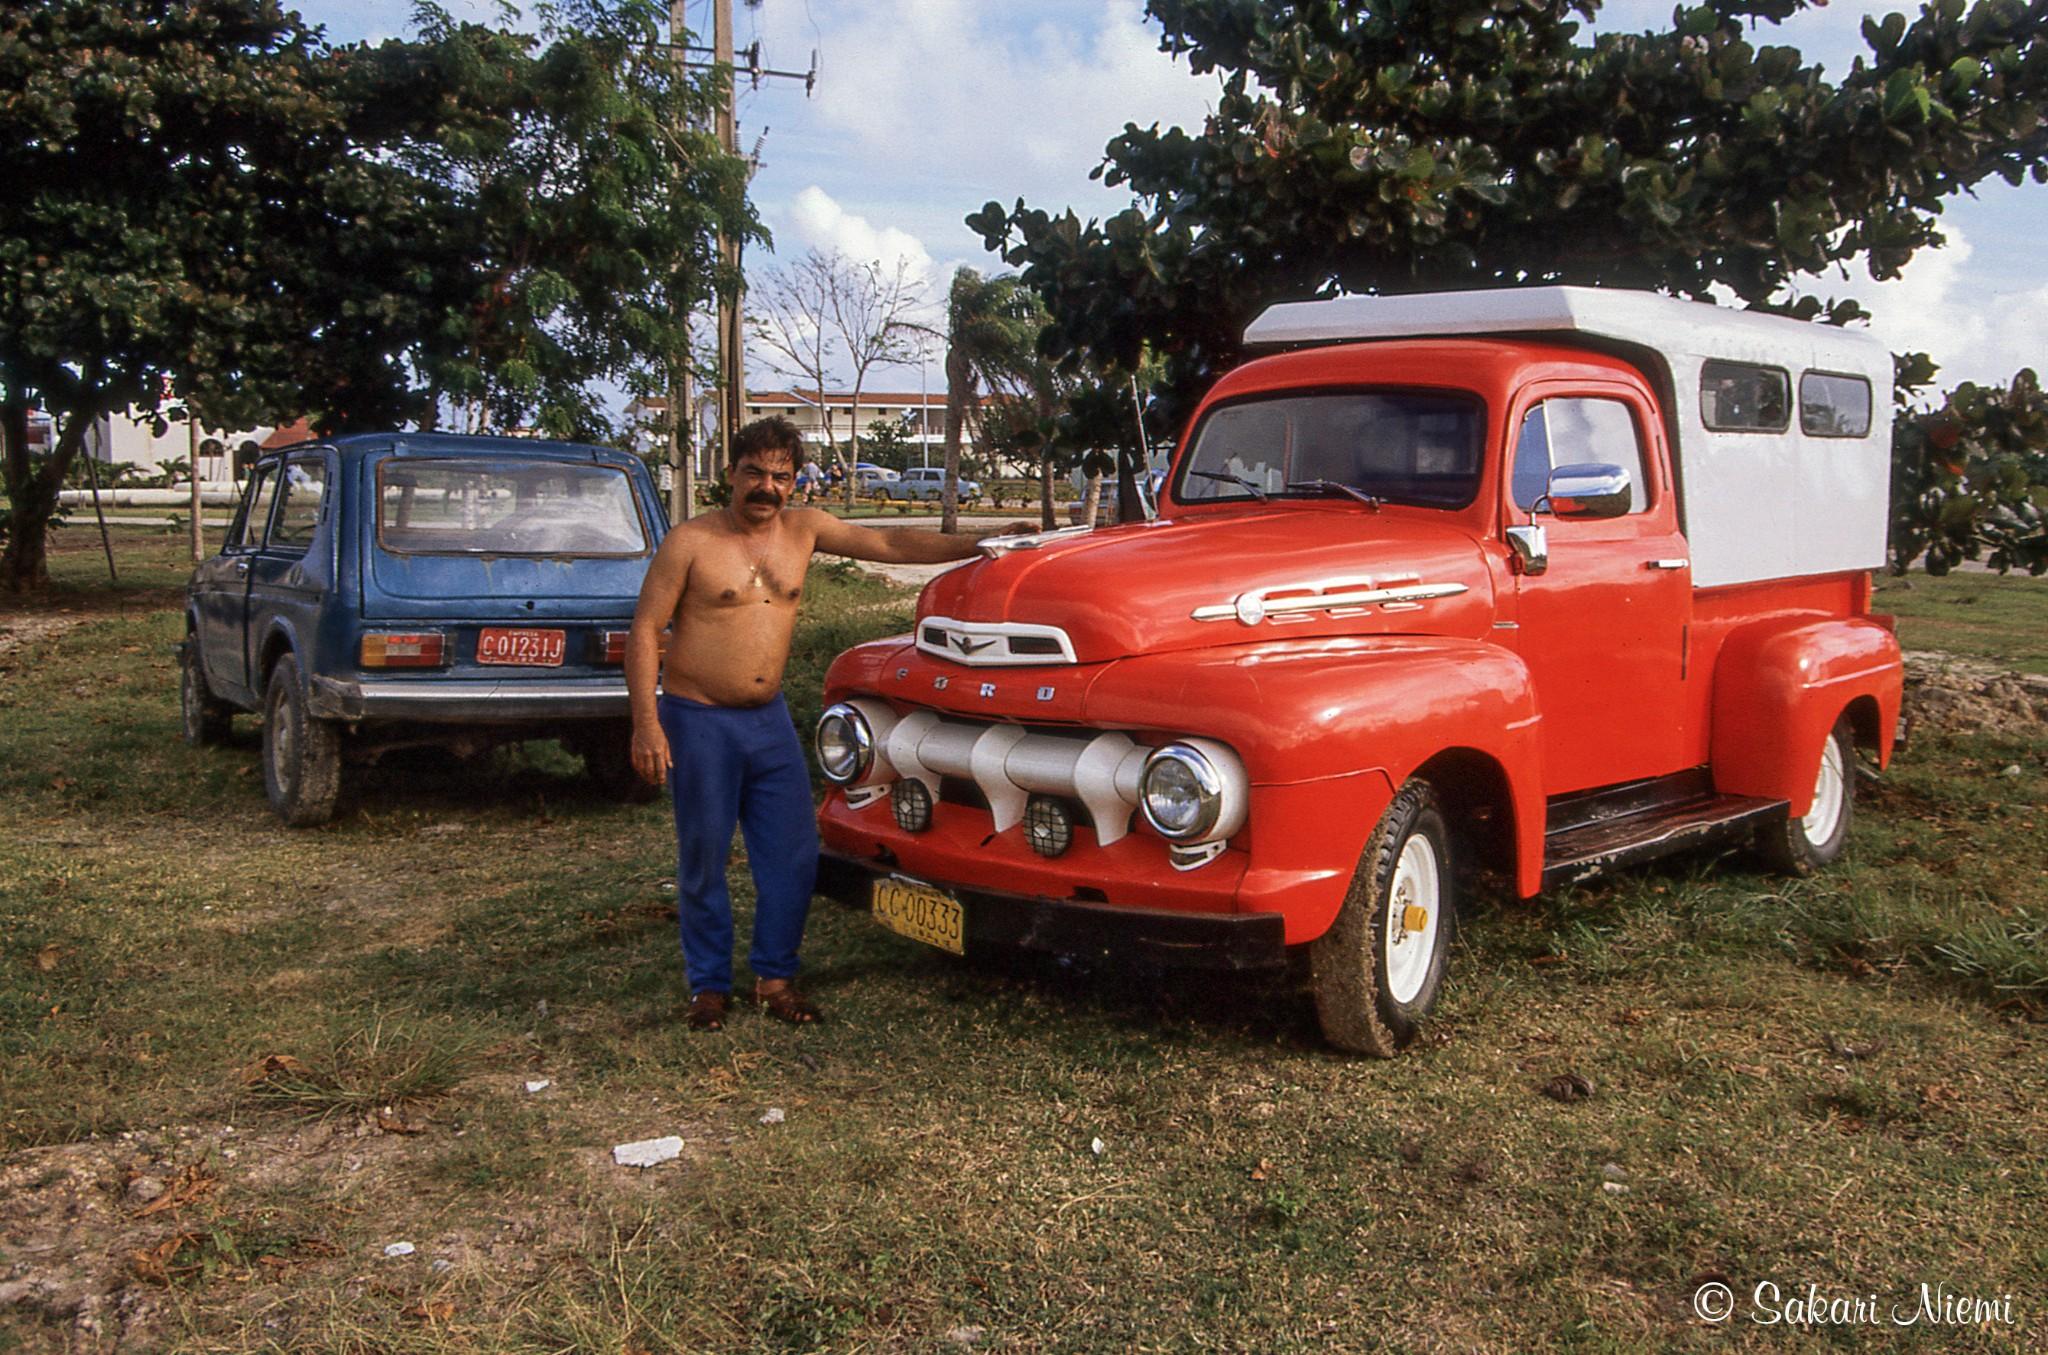 Kuuba 1951 52 Ford Pick Up Cu252732 Santa Luciassa Camageyssa